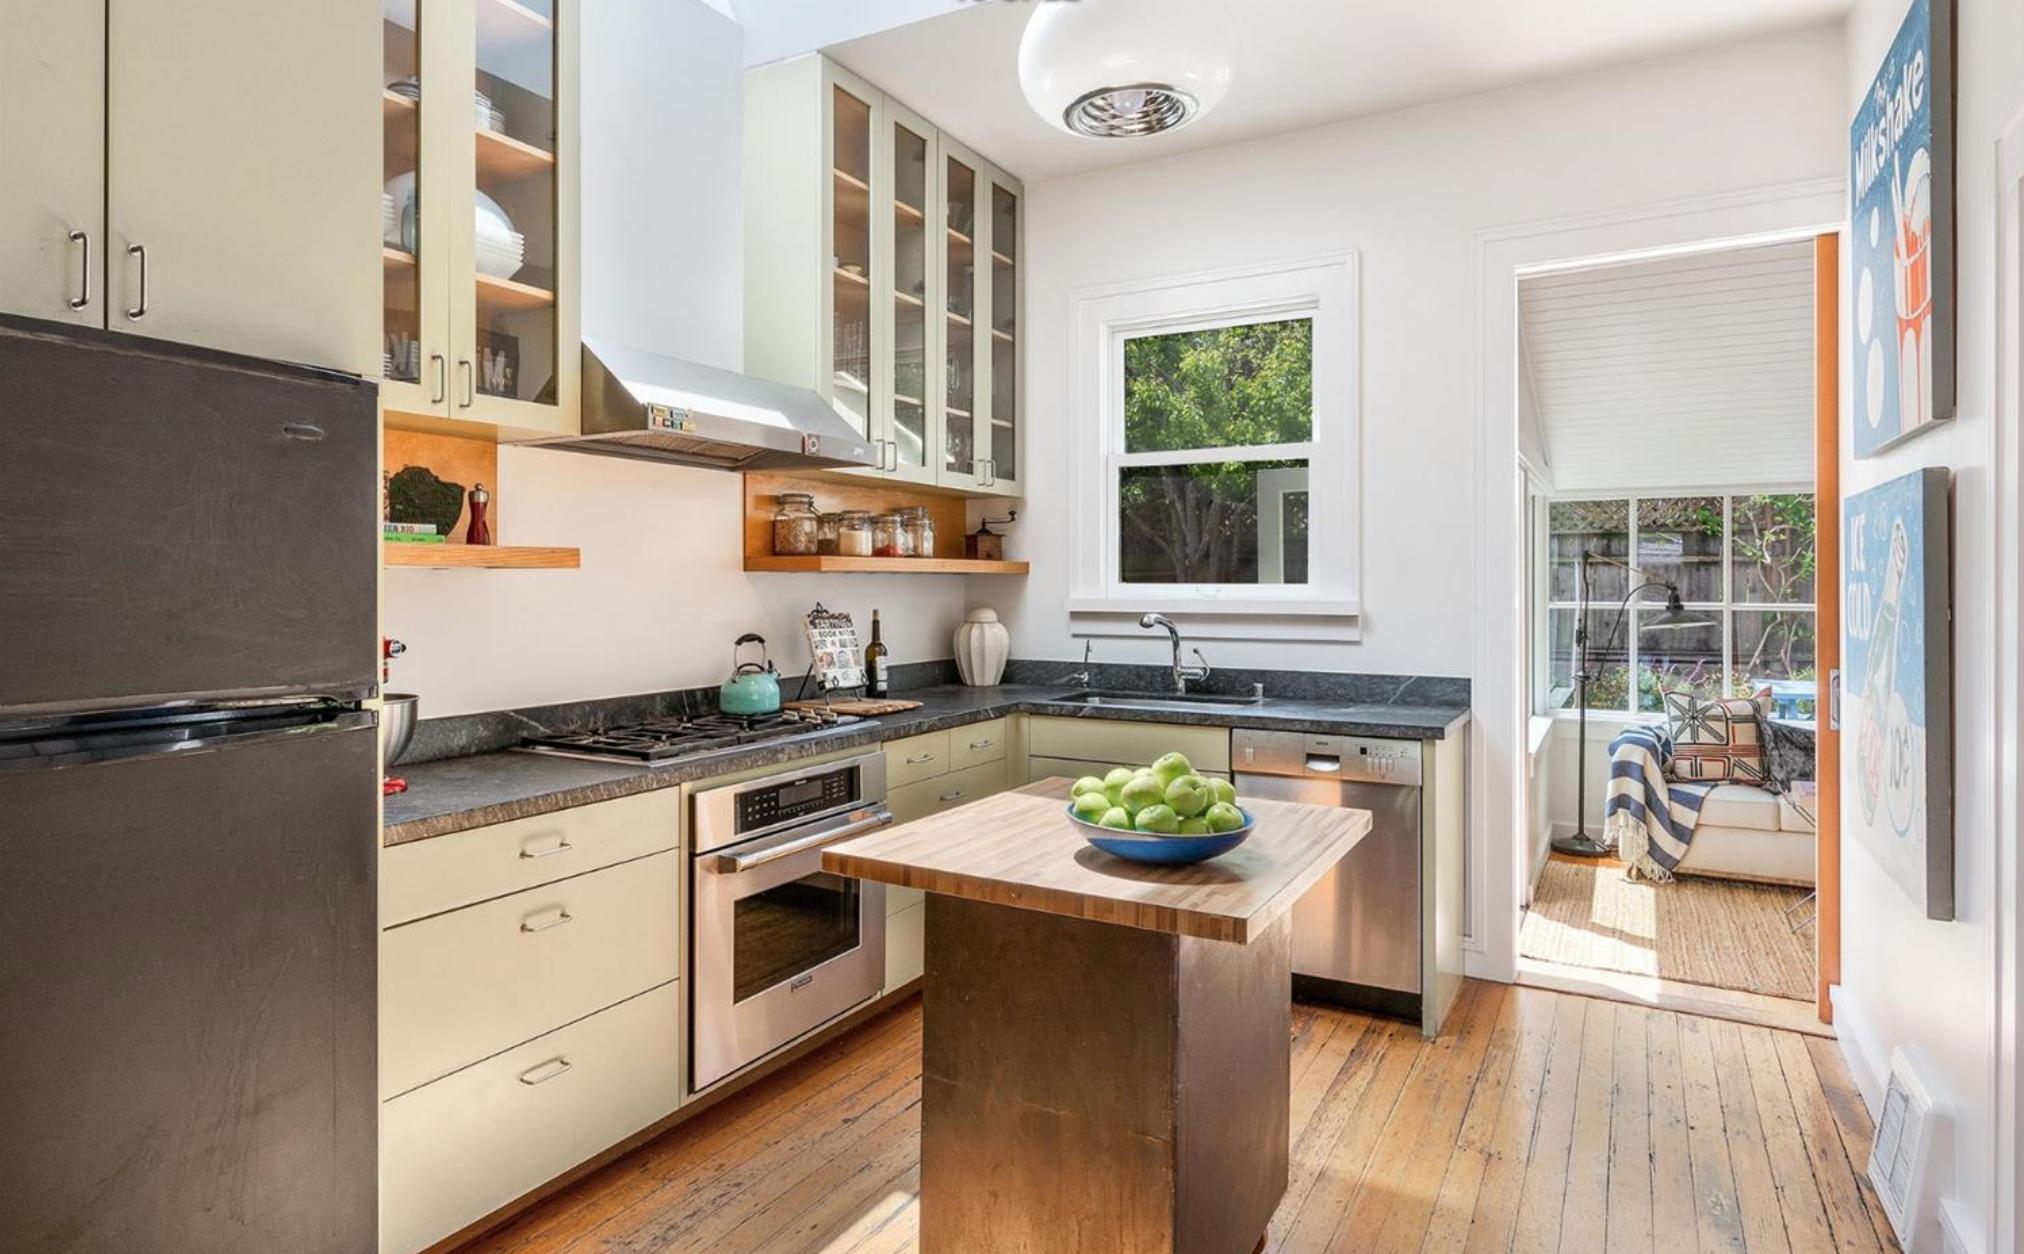 1374 Sanchez Street - Kitchen Area